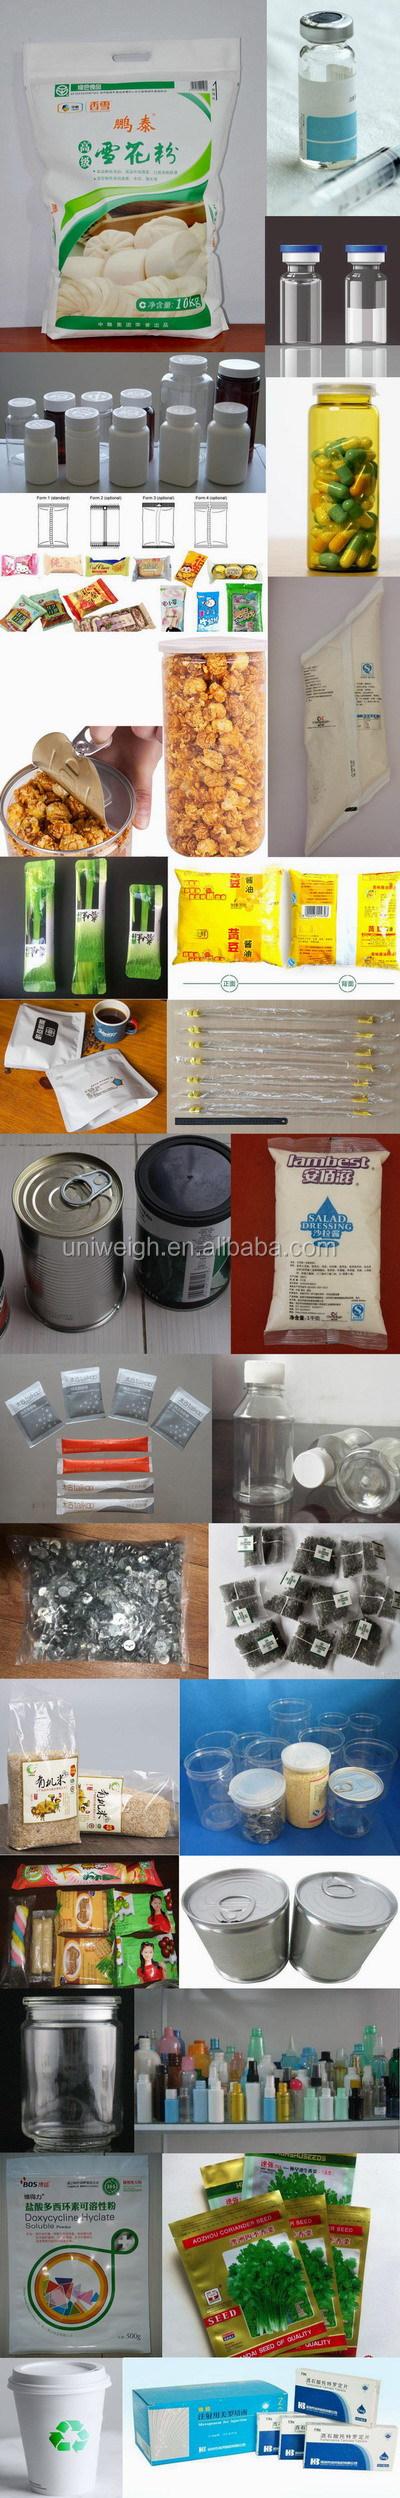 500-1000kg powder granule corn wheat rice sand fertilizer catalyst breeze calcium cement concrete ton bag weight packing machine